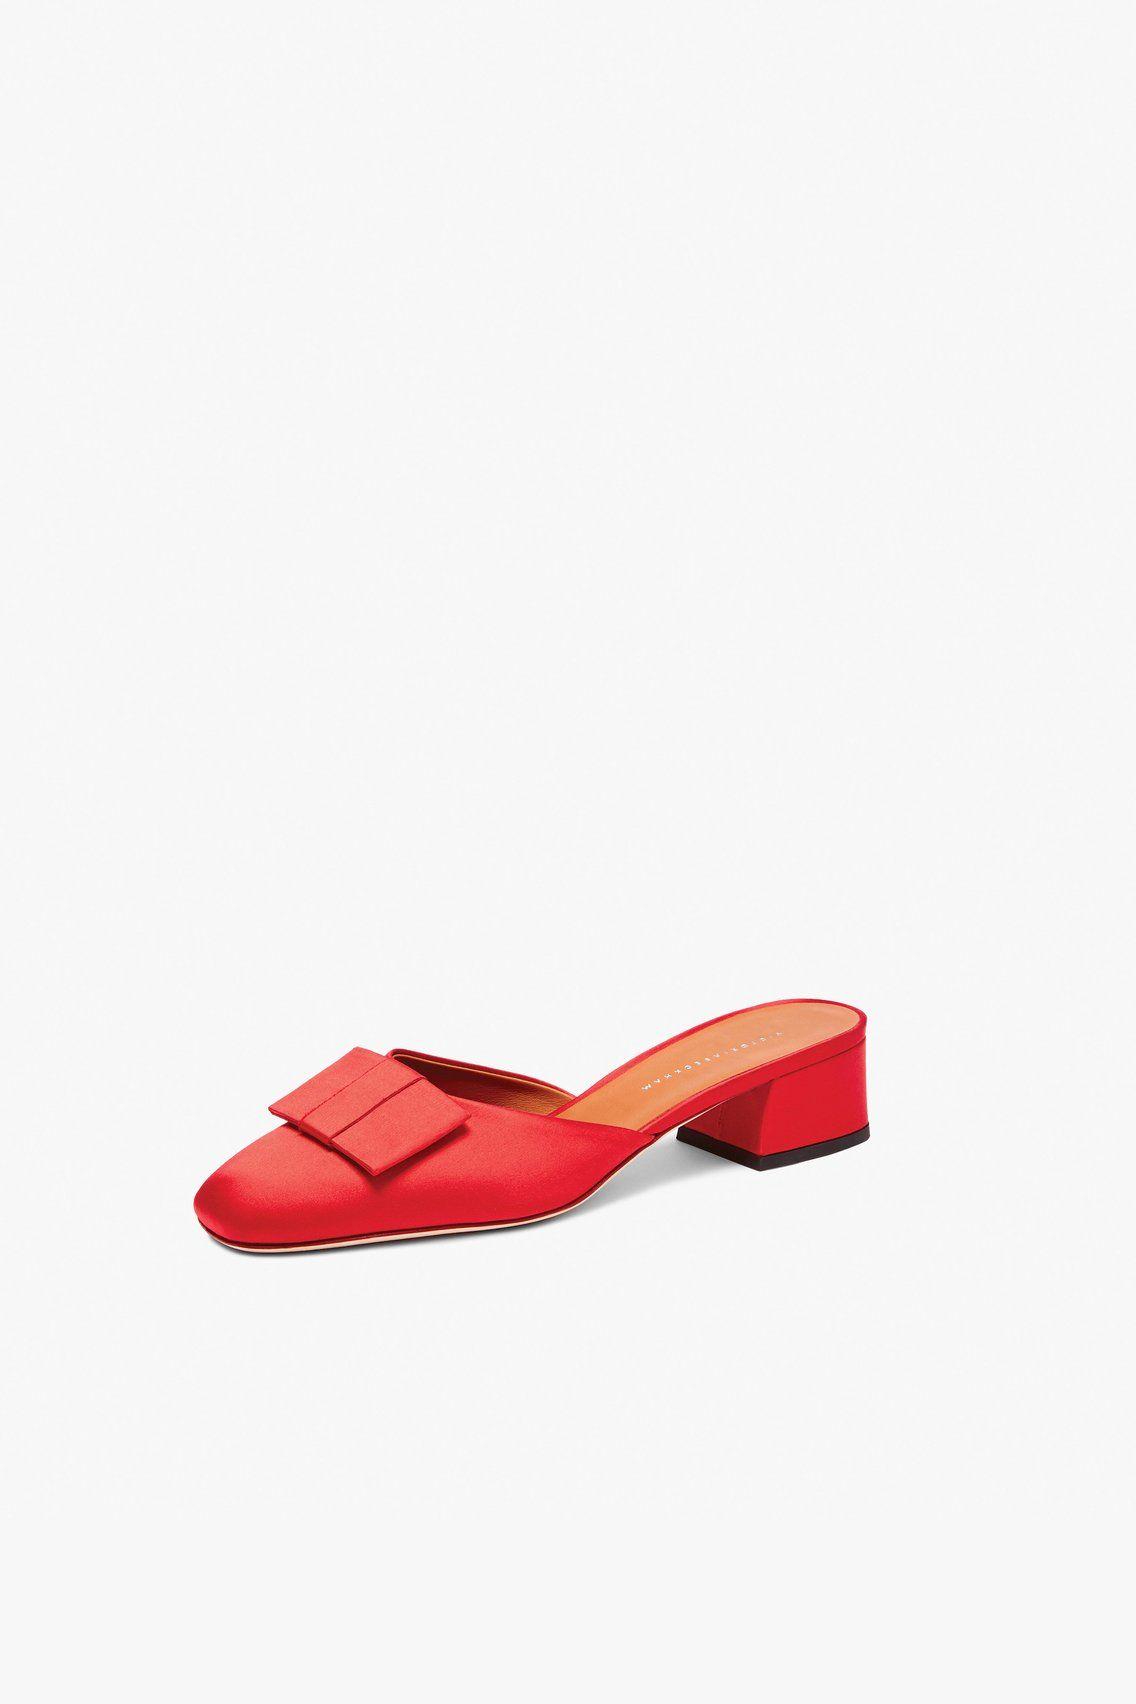 I Do Harper Adore SlippersVictoria Beckham SlipperShoes g7fyb6